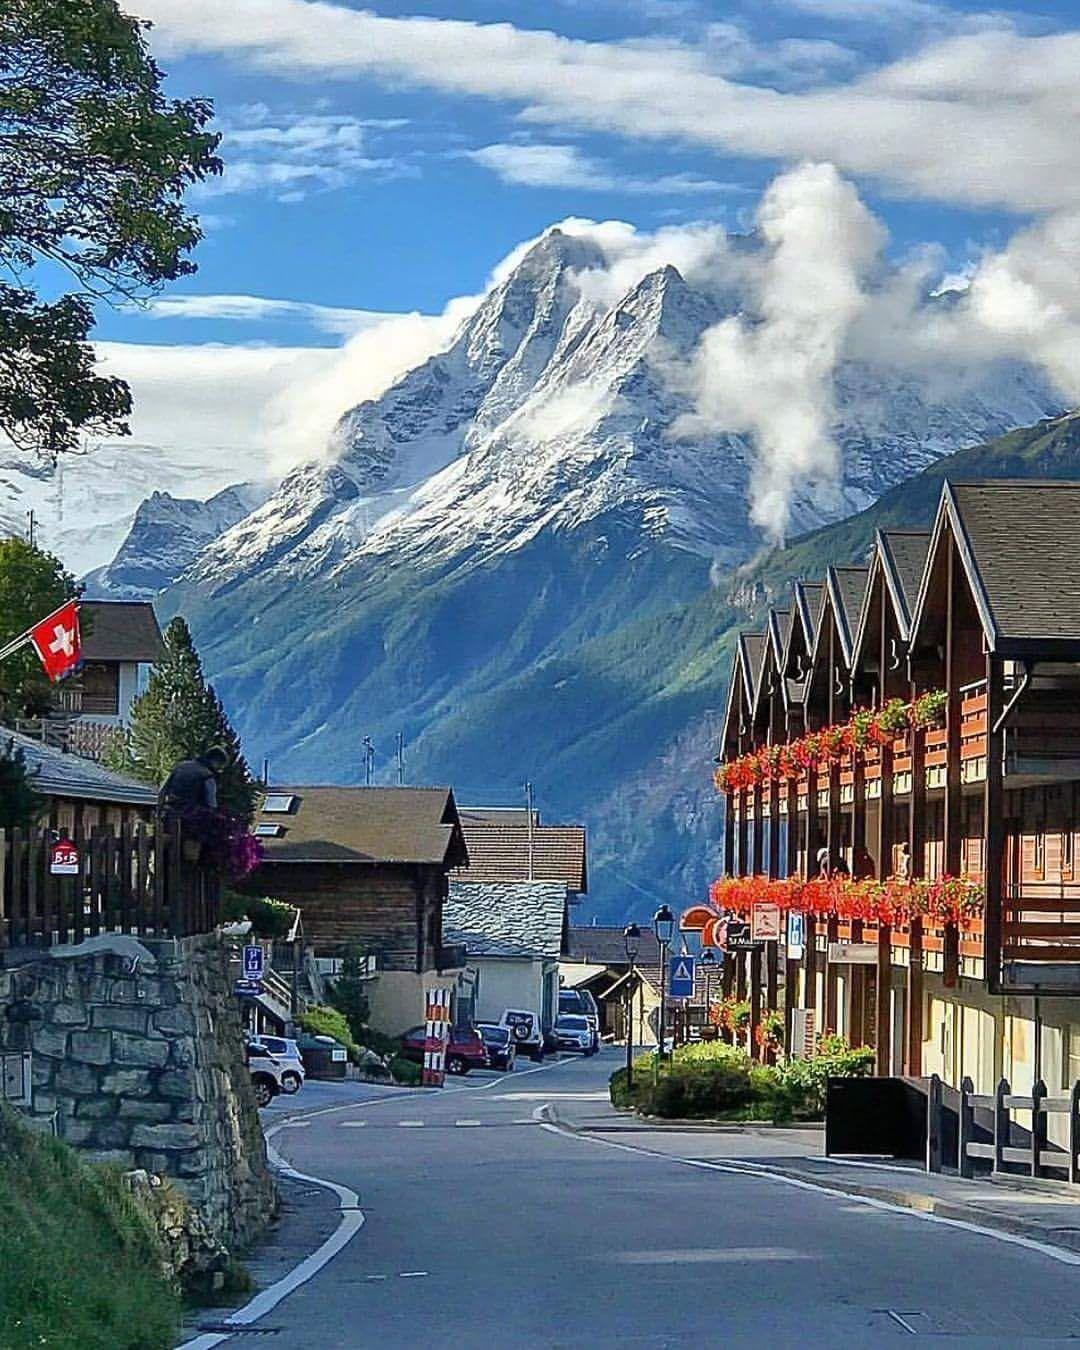 Amazing Places To Stay Switzerland: Beautiful Mountain Scenery In Switzerland.